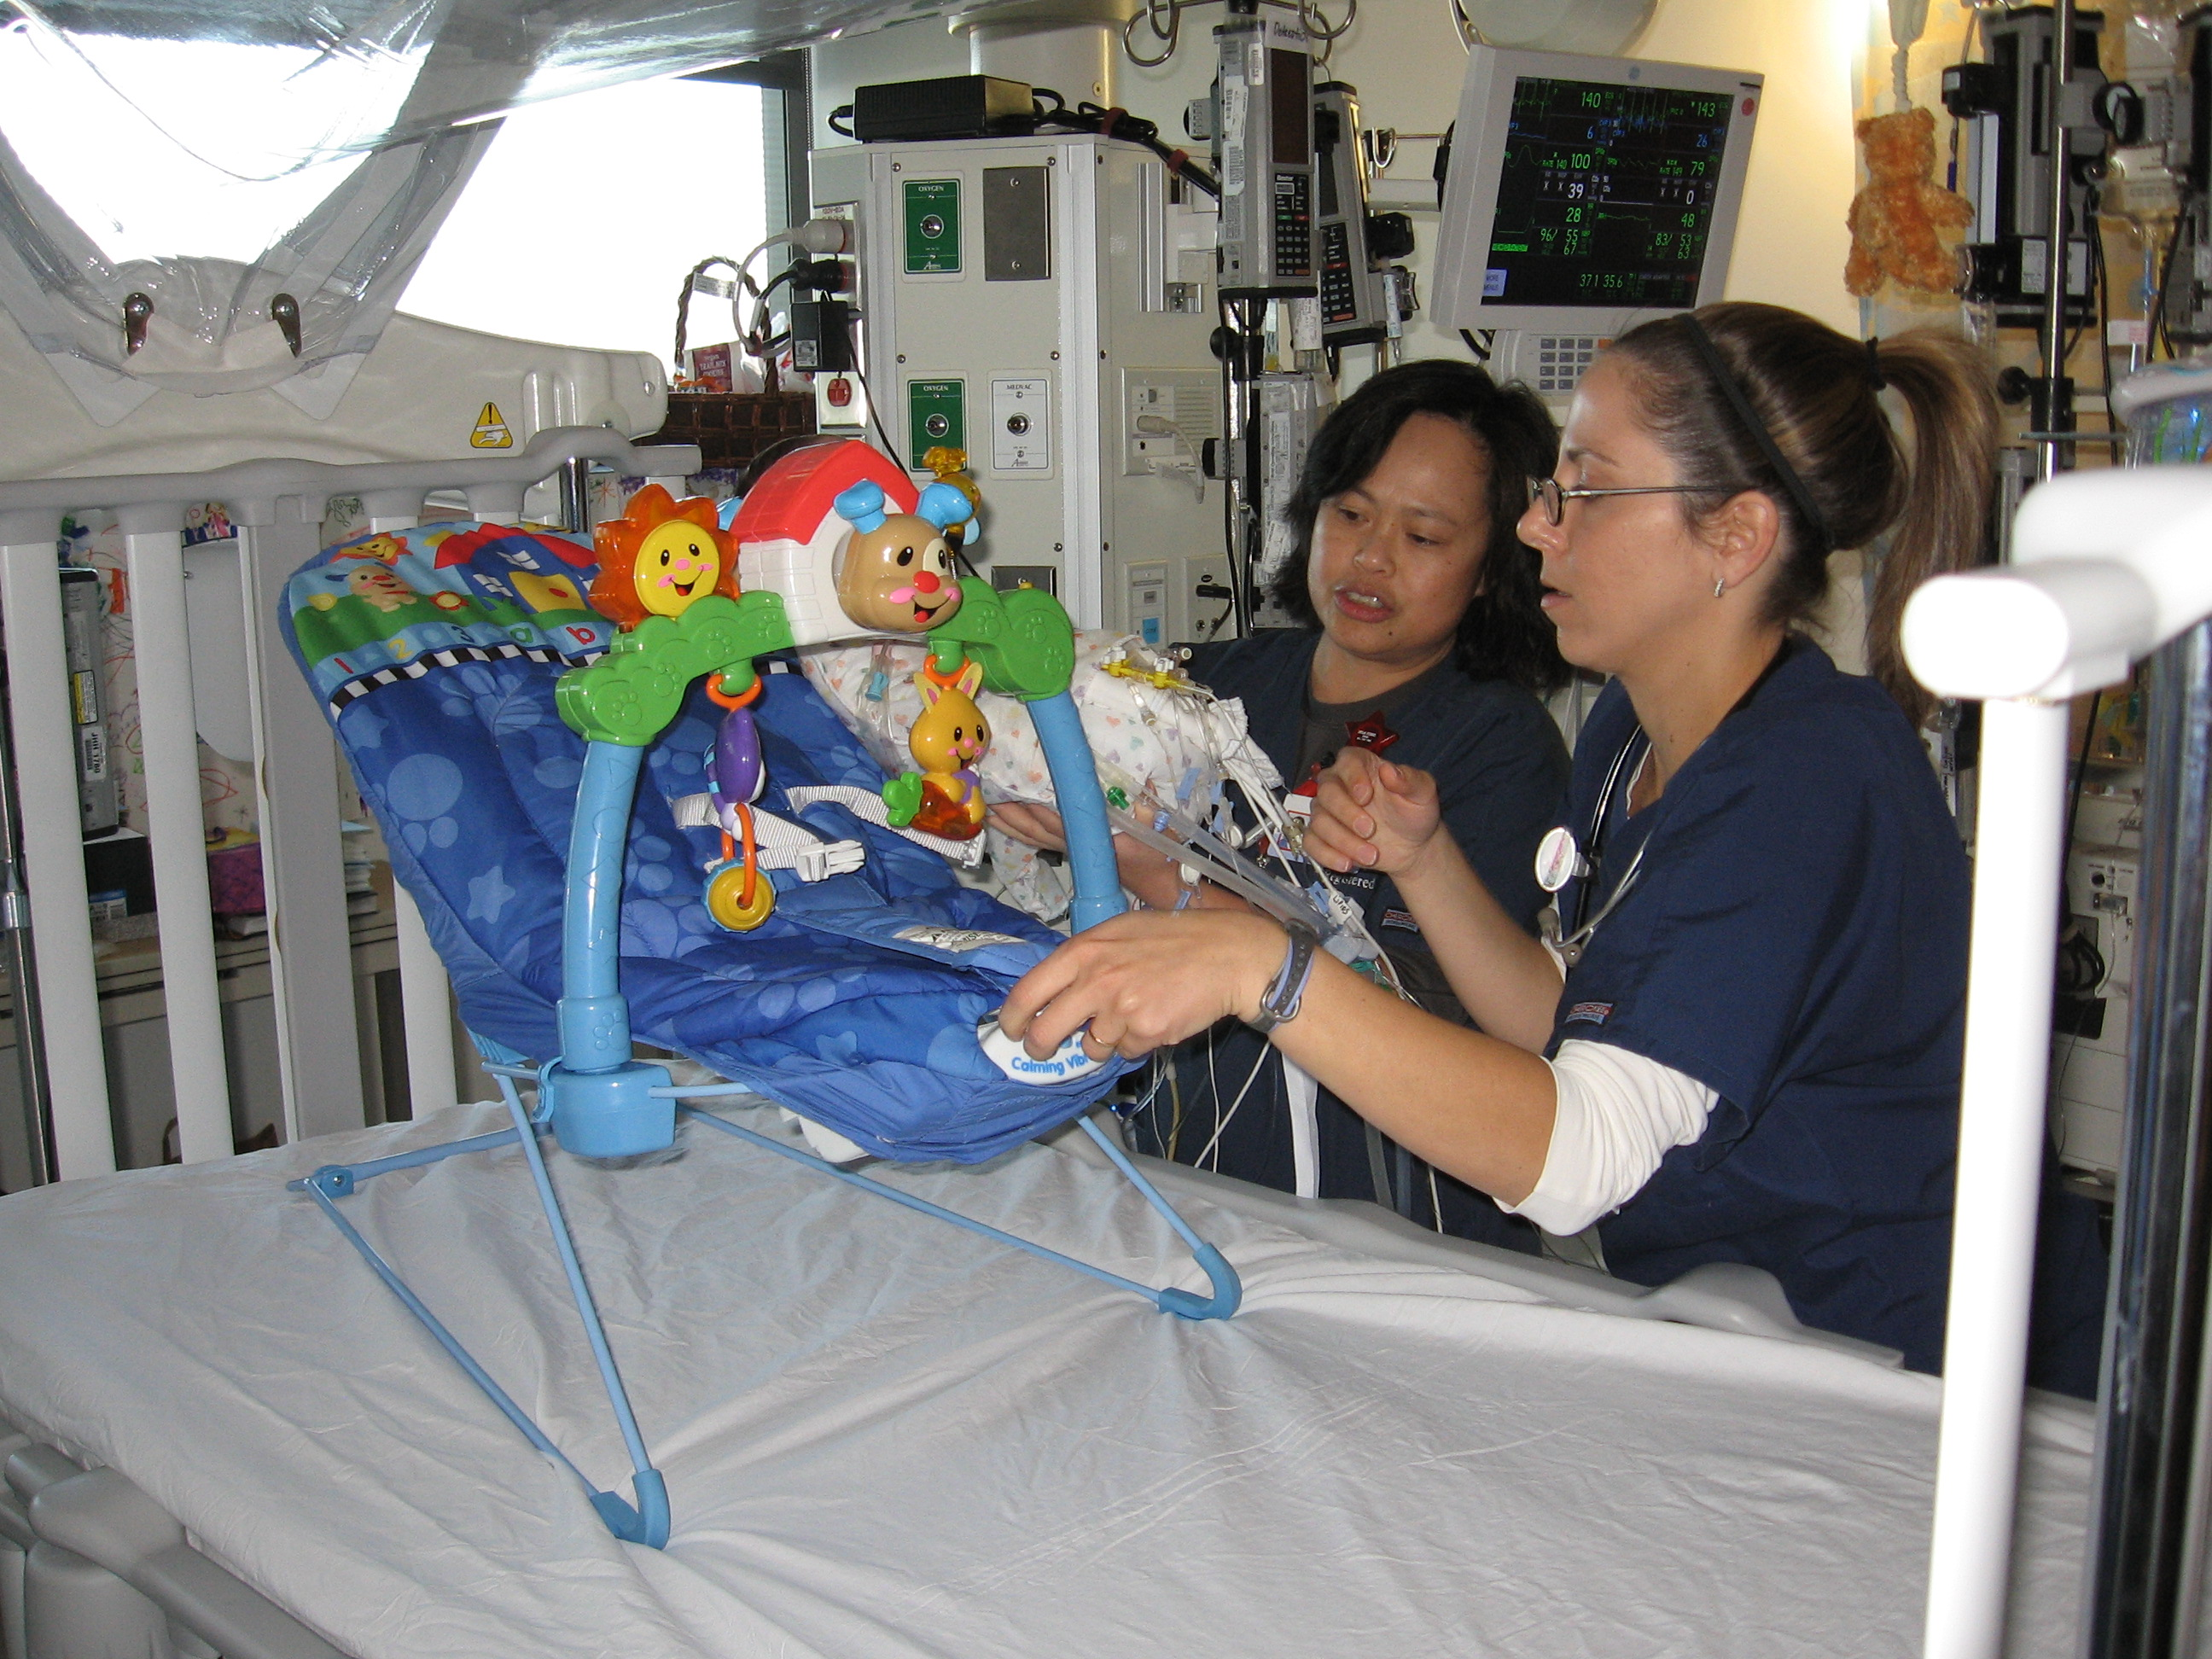 Nurses Filma and Rosella position Rudy